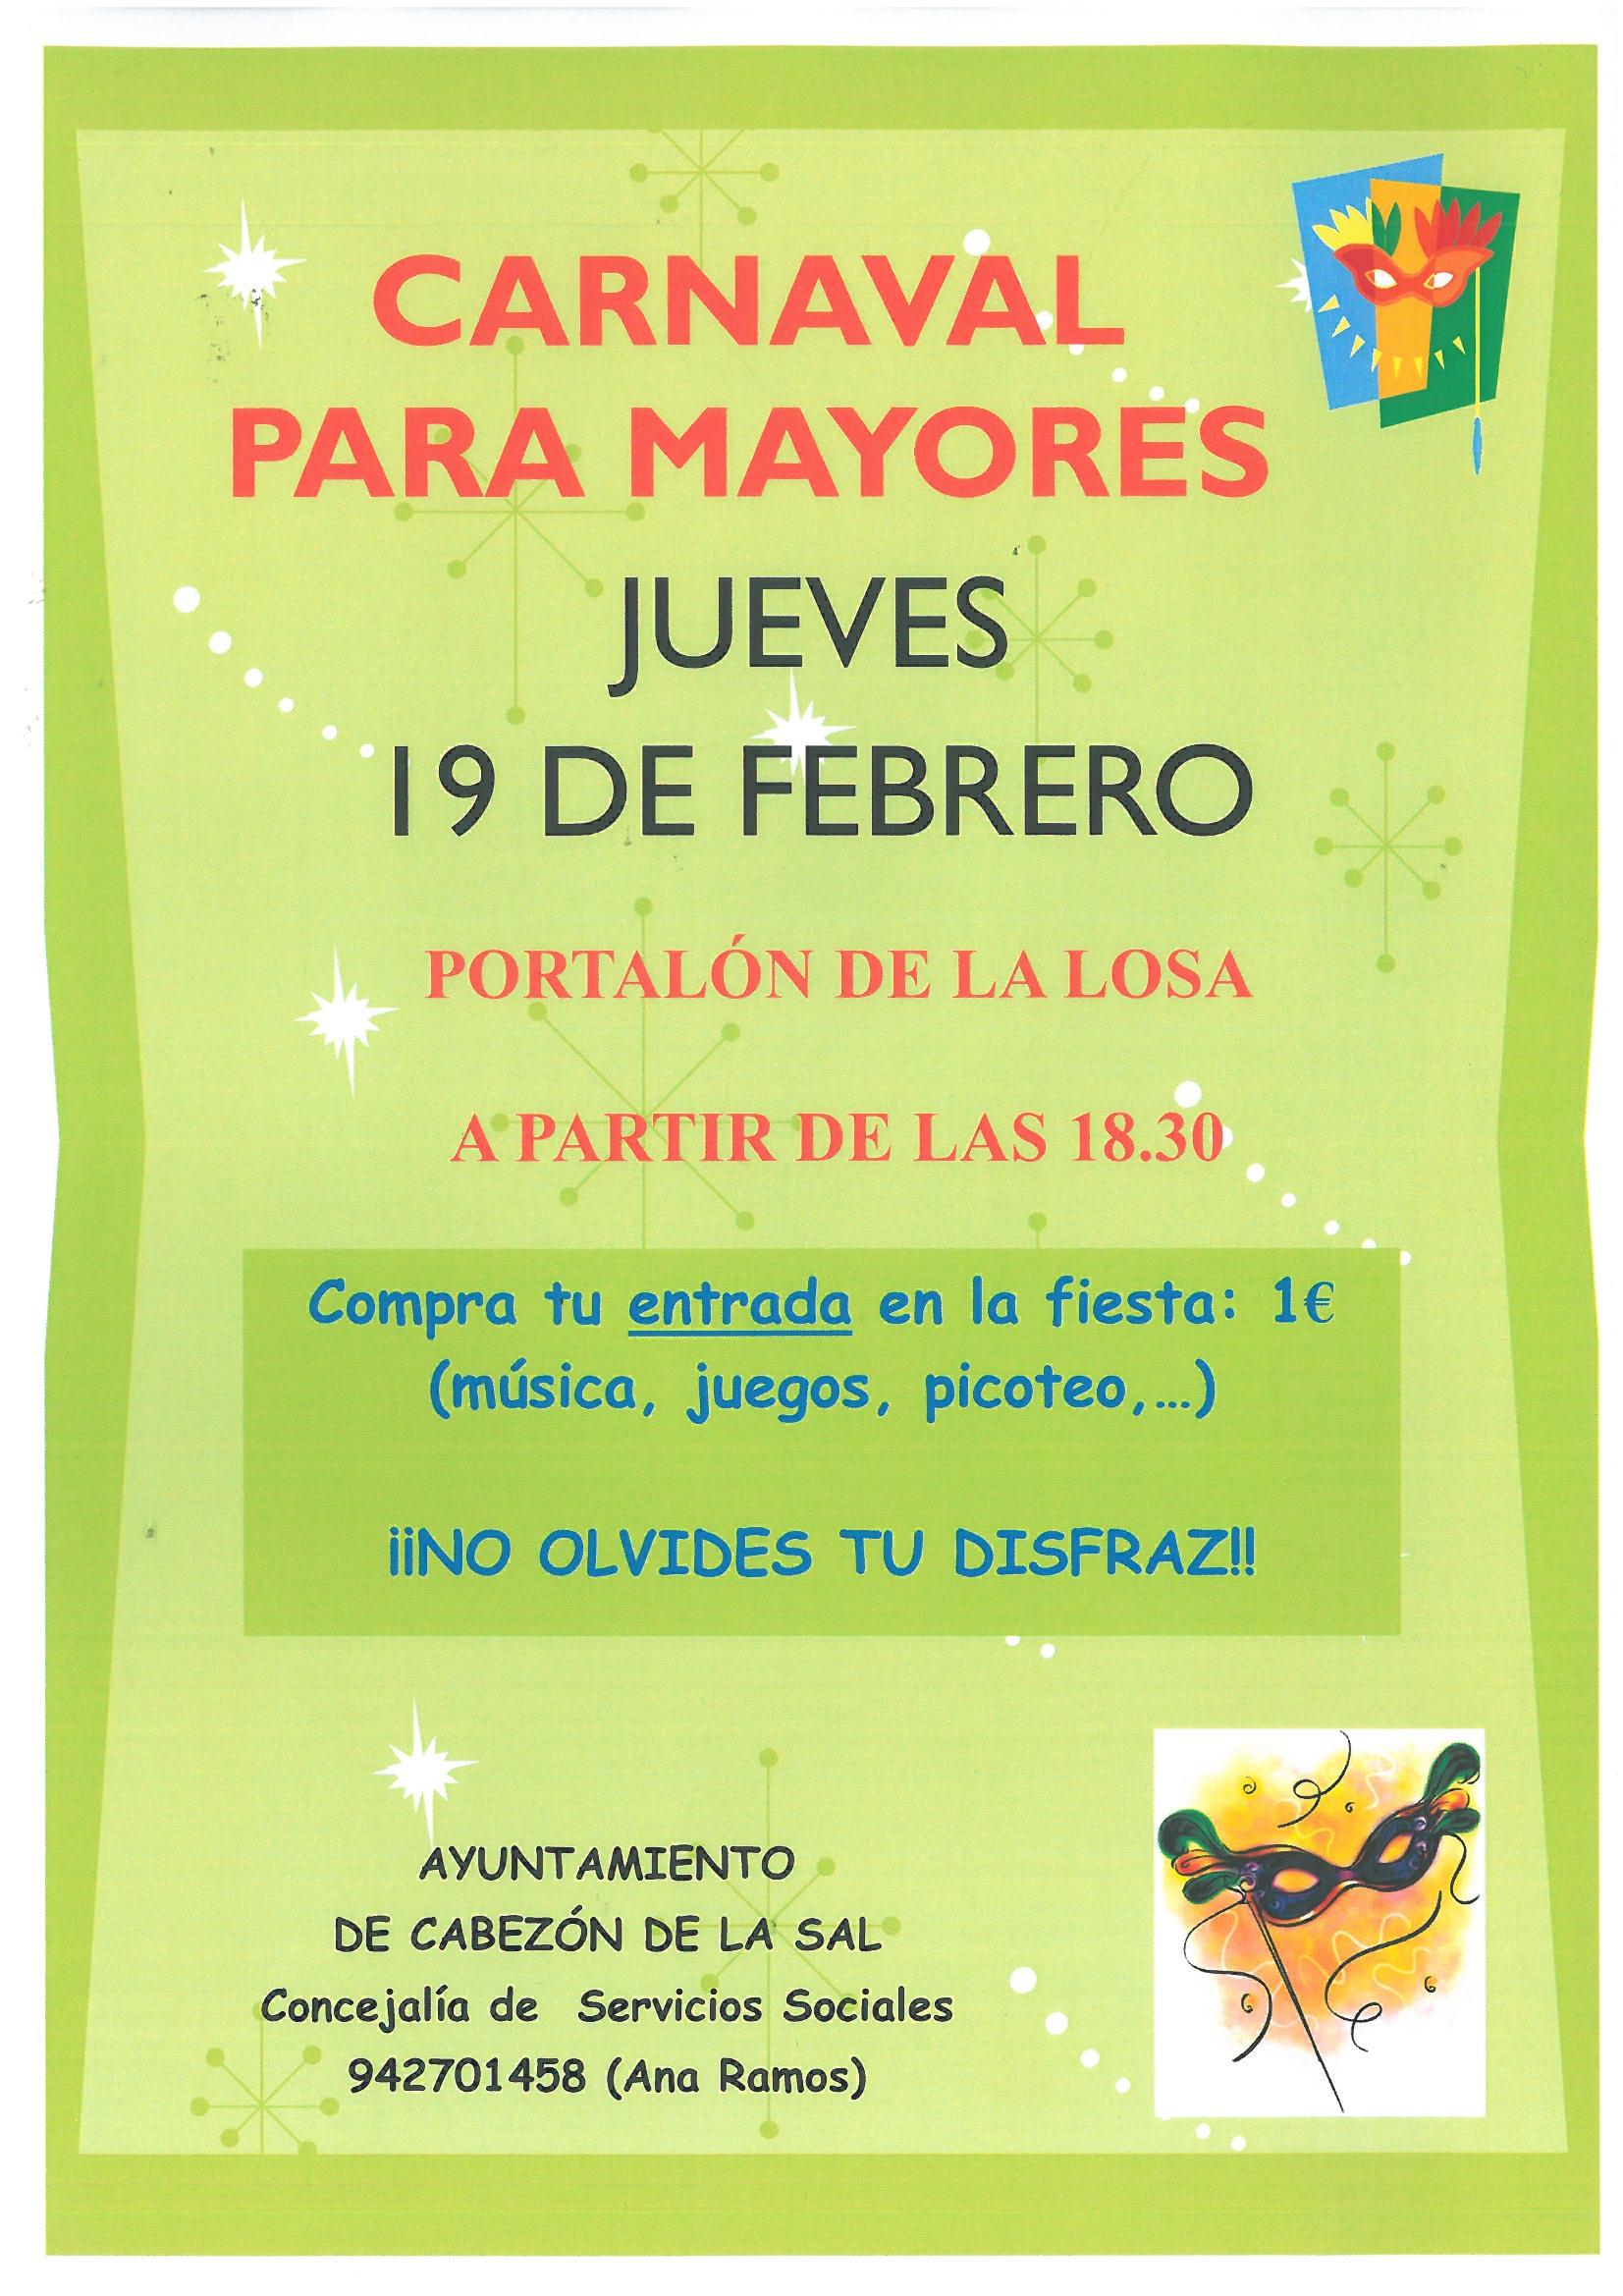 http://www.cabezondelasal.net/wp-content/uploads/2015/01/Carnaval-Mayores.jpg